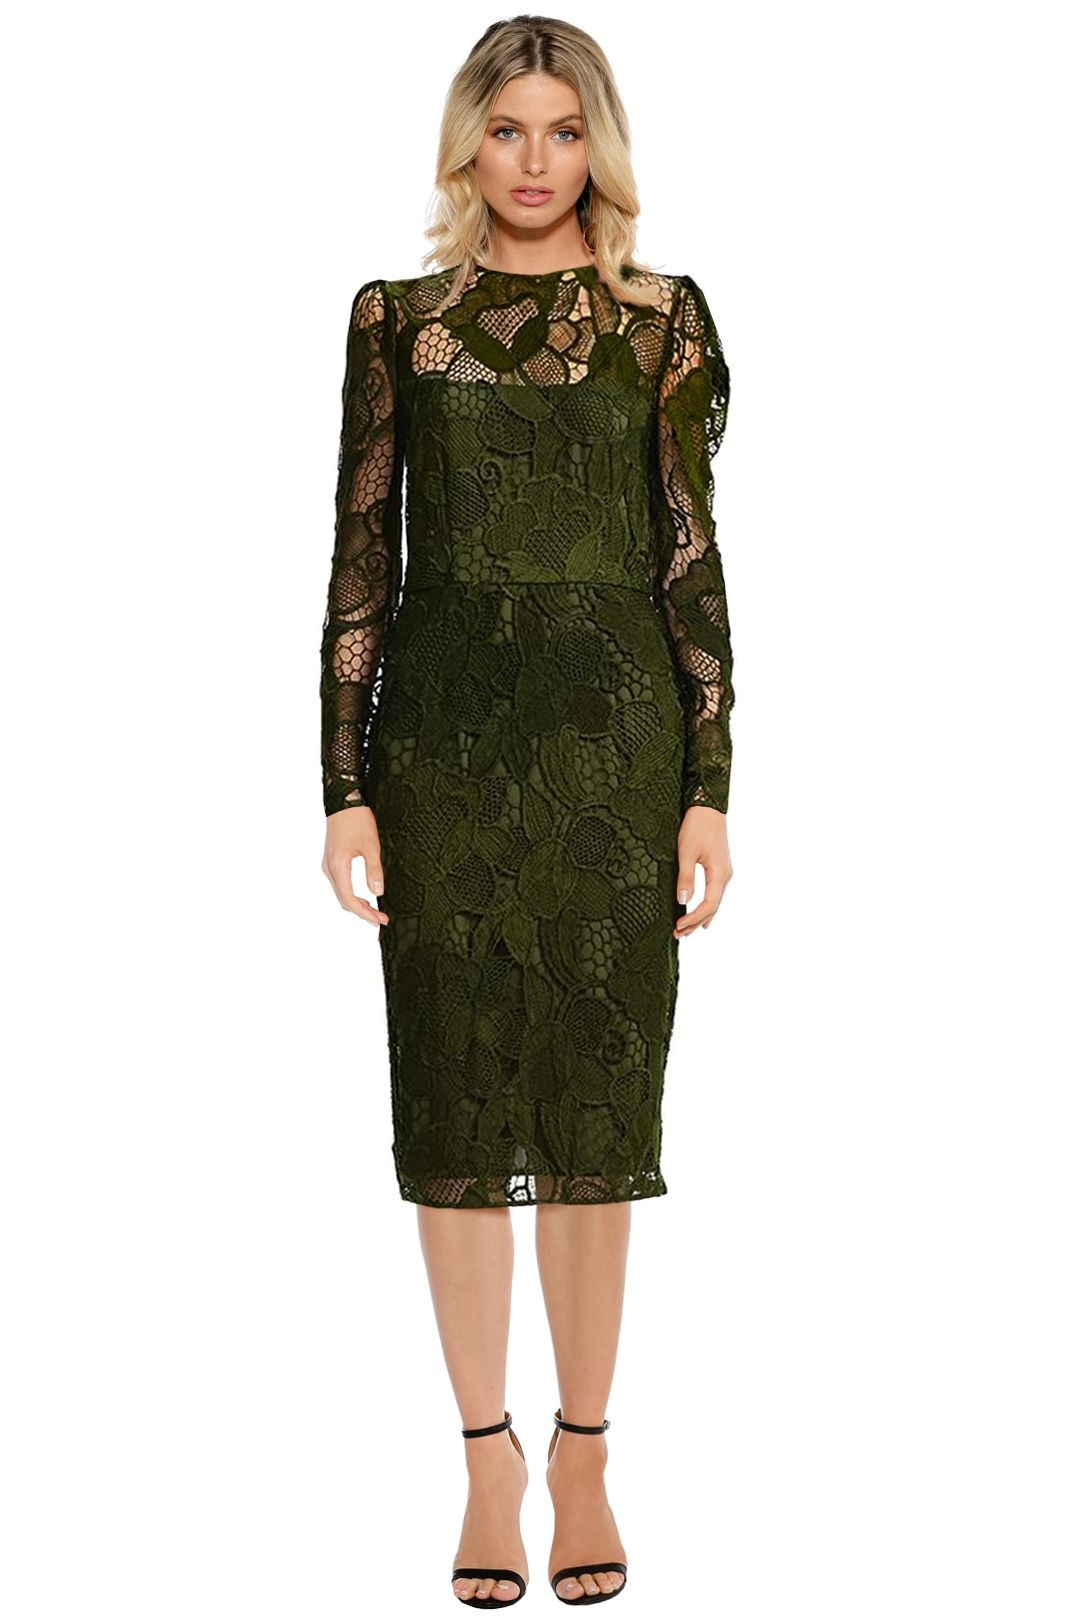 Cooper St - Cast Away Lace Dress - Dark Green - Front